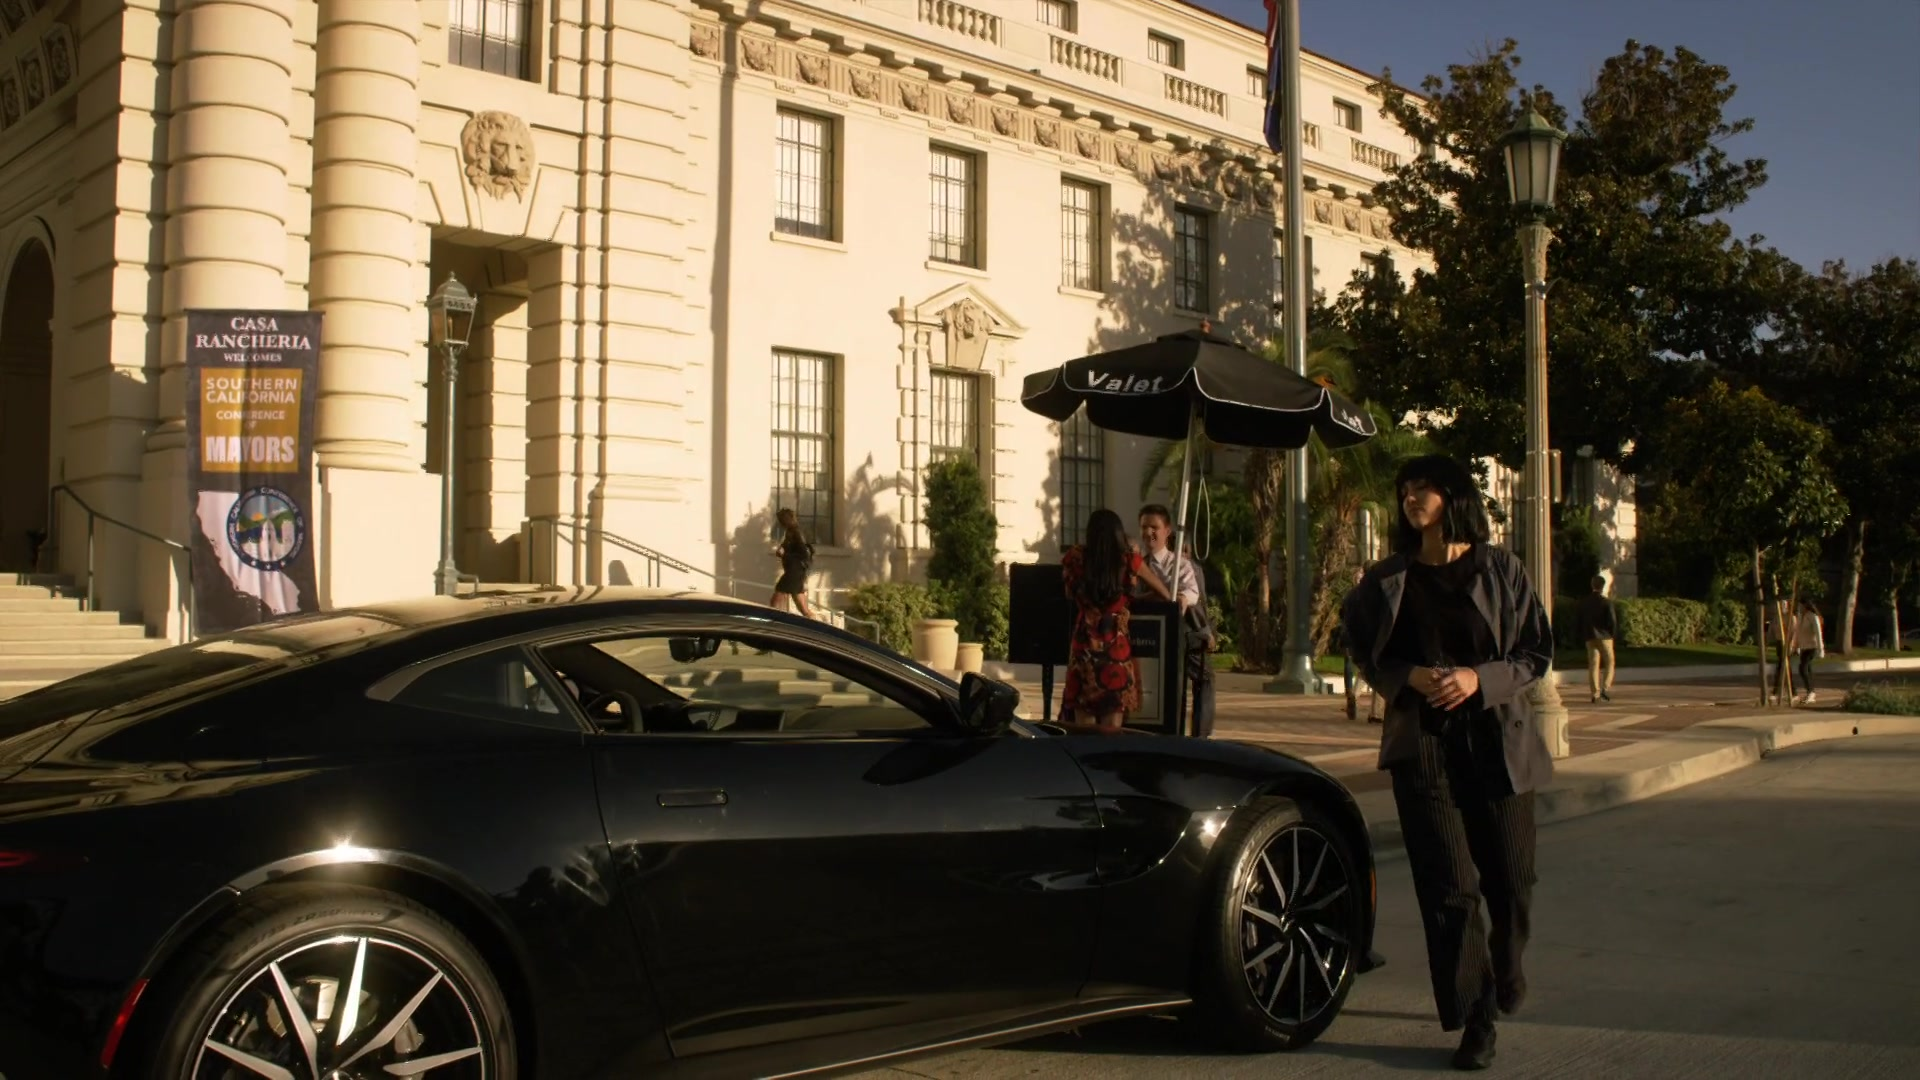 Aston Martin Vantage Car Of Gabrielle Union As Syd In L A S Finest S02e03 Thief Of Hearts 2020